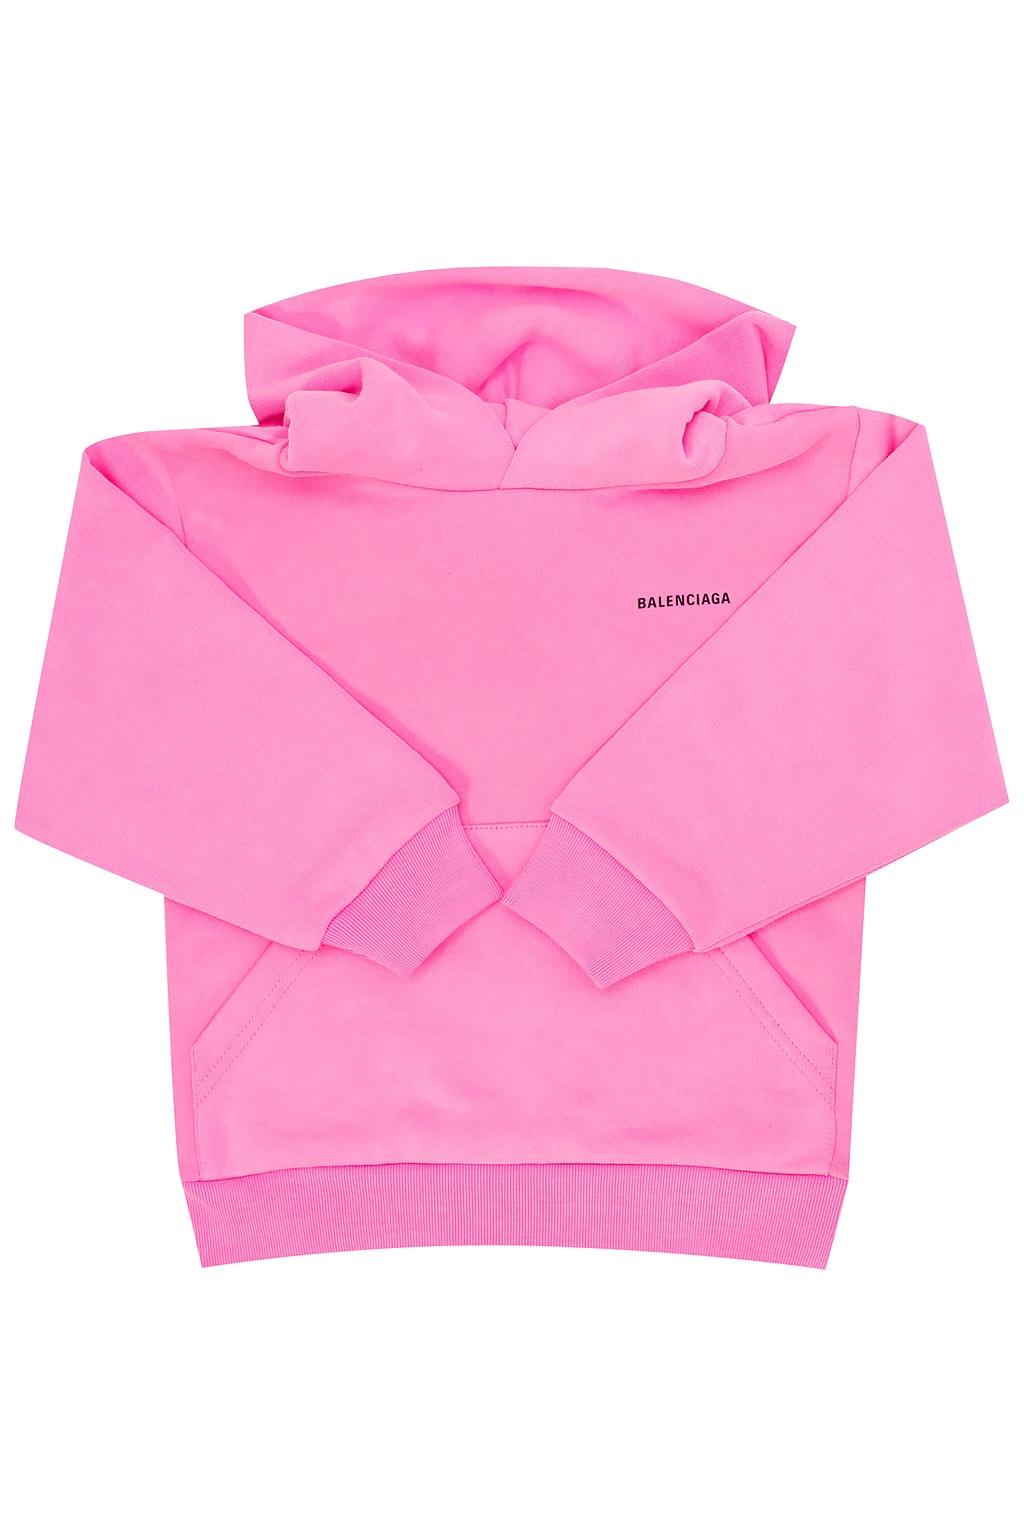 Balenciaga Kids 品牌连帽运动衫